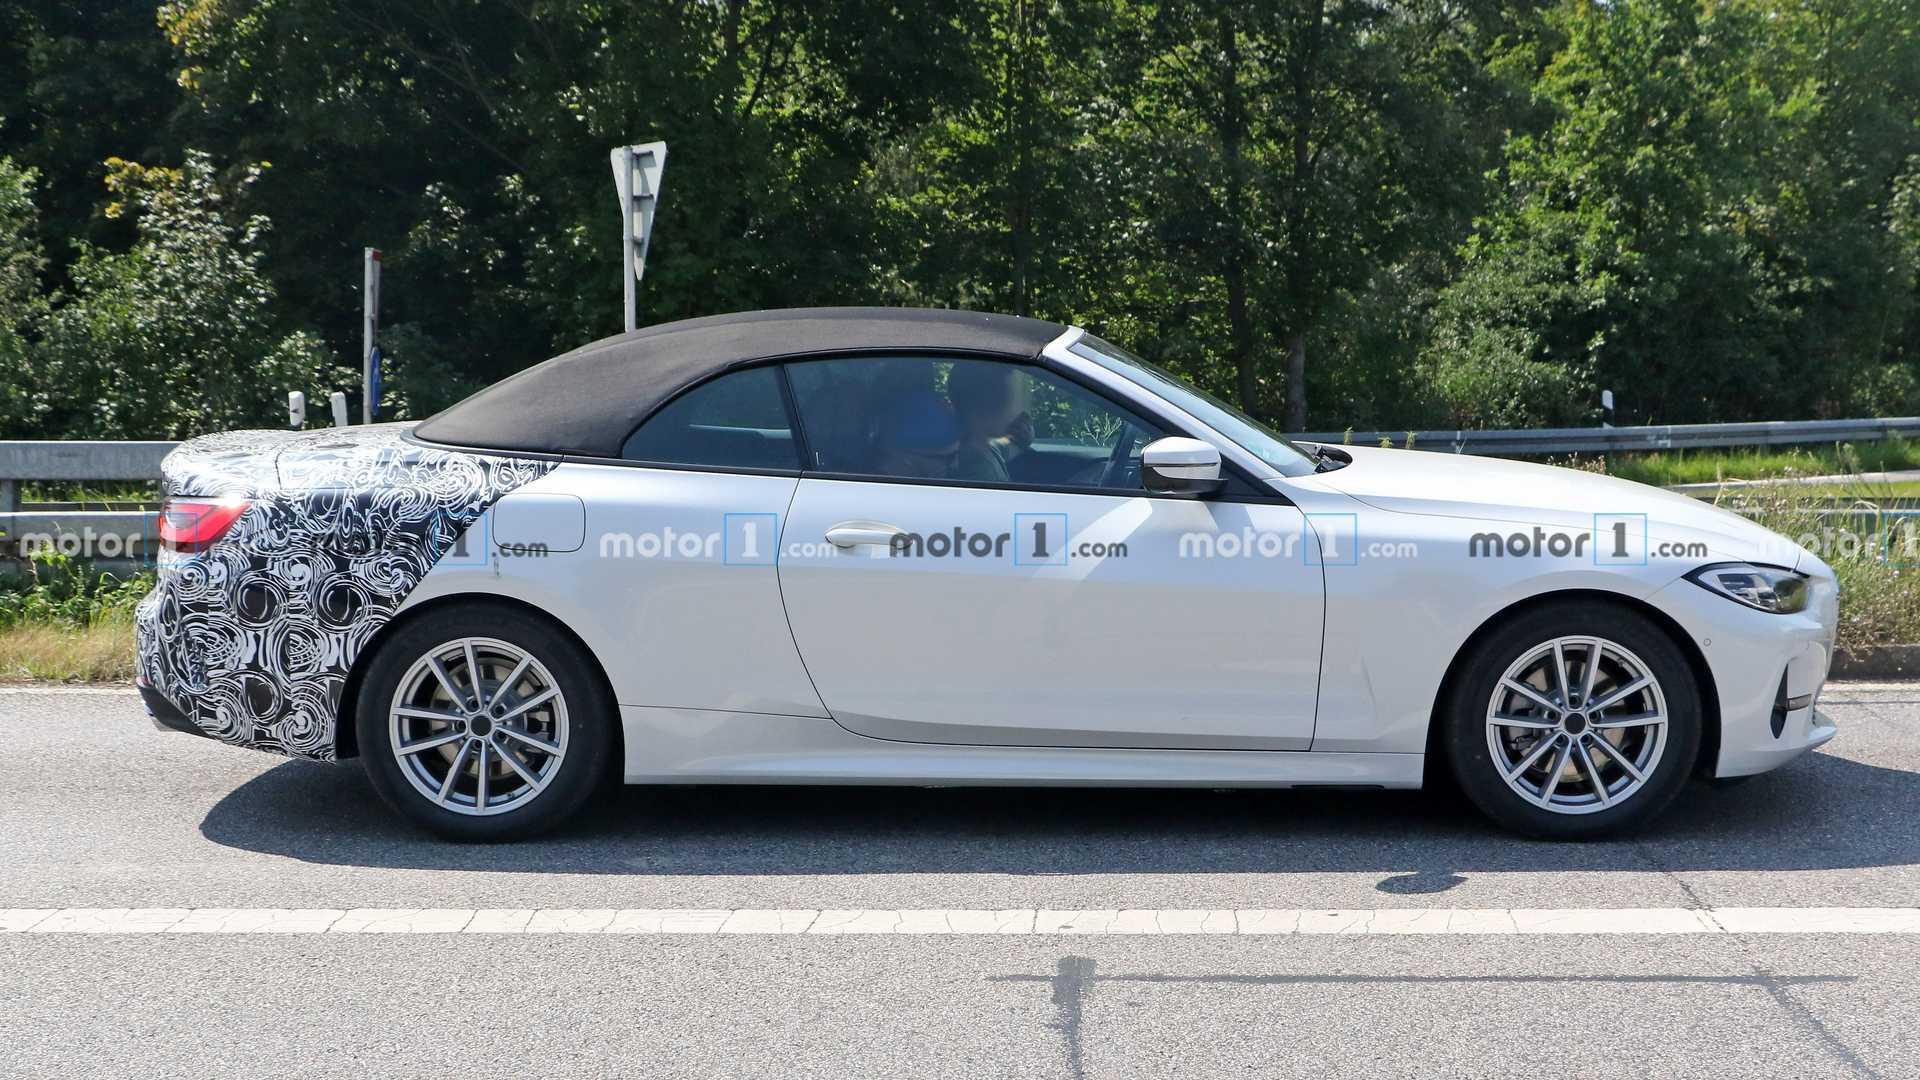 2020 - [BMW] Série 4 Coupé/Cabriolet G23-G22 - Page 16 New-bmw-4-series-convertible-profile